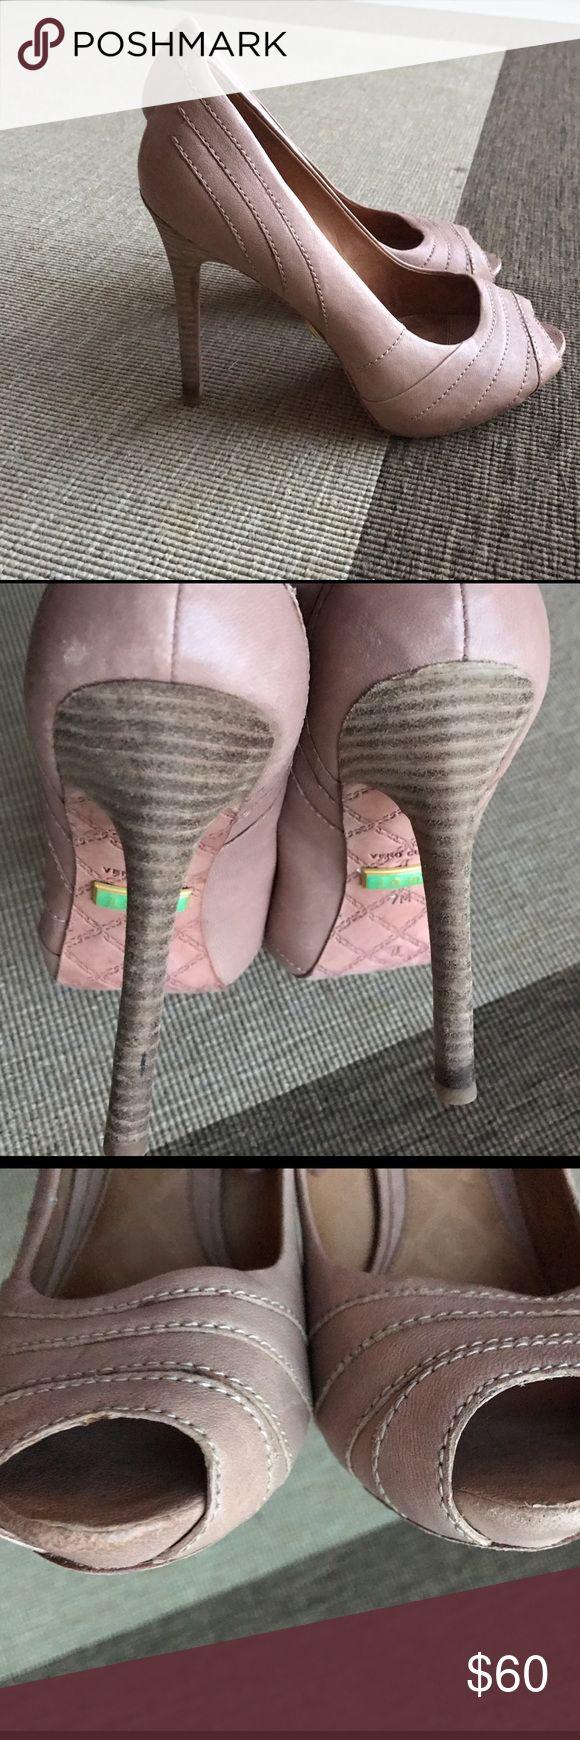 Nude LAMB shoes. Size 7. Perfect condition. Worn ones. LAMB. 7 M. L.A.M.B. Shoes Platforms